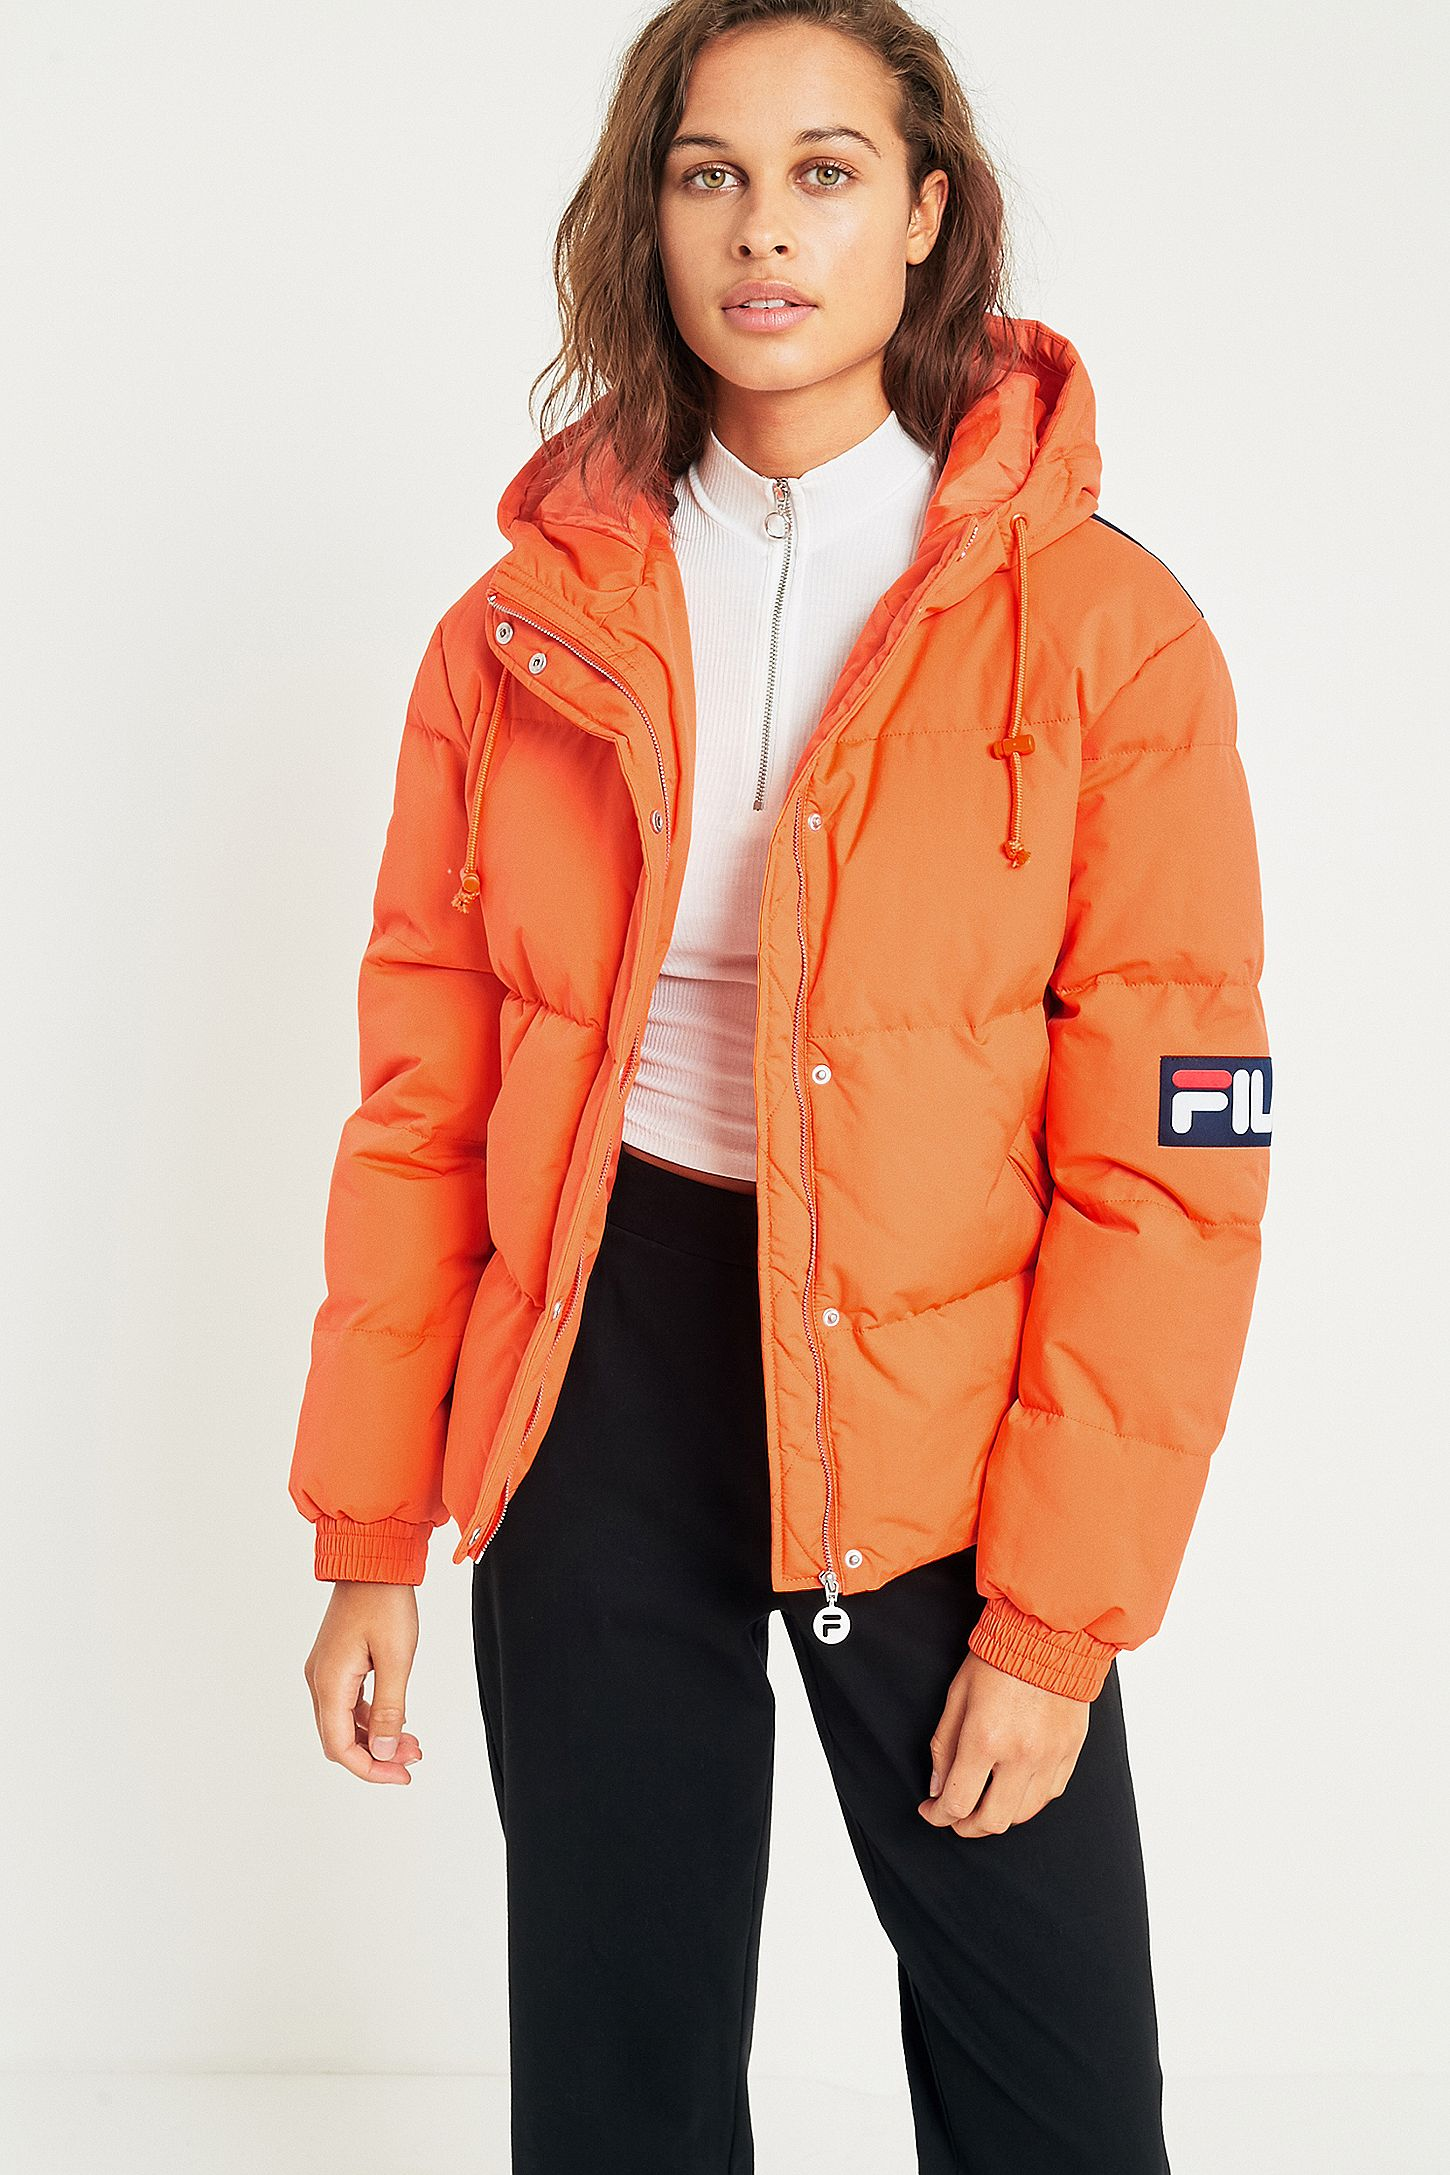 904a6cfb43cd FILA Orange Puffer Jacket